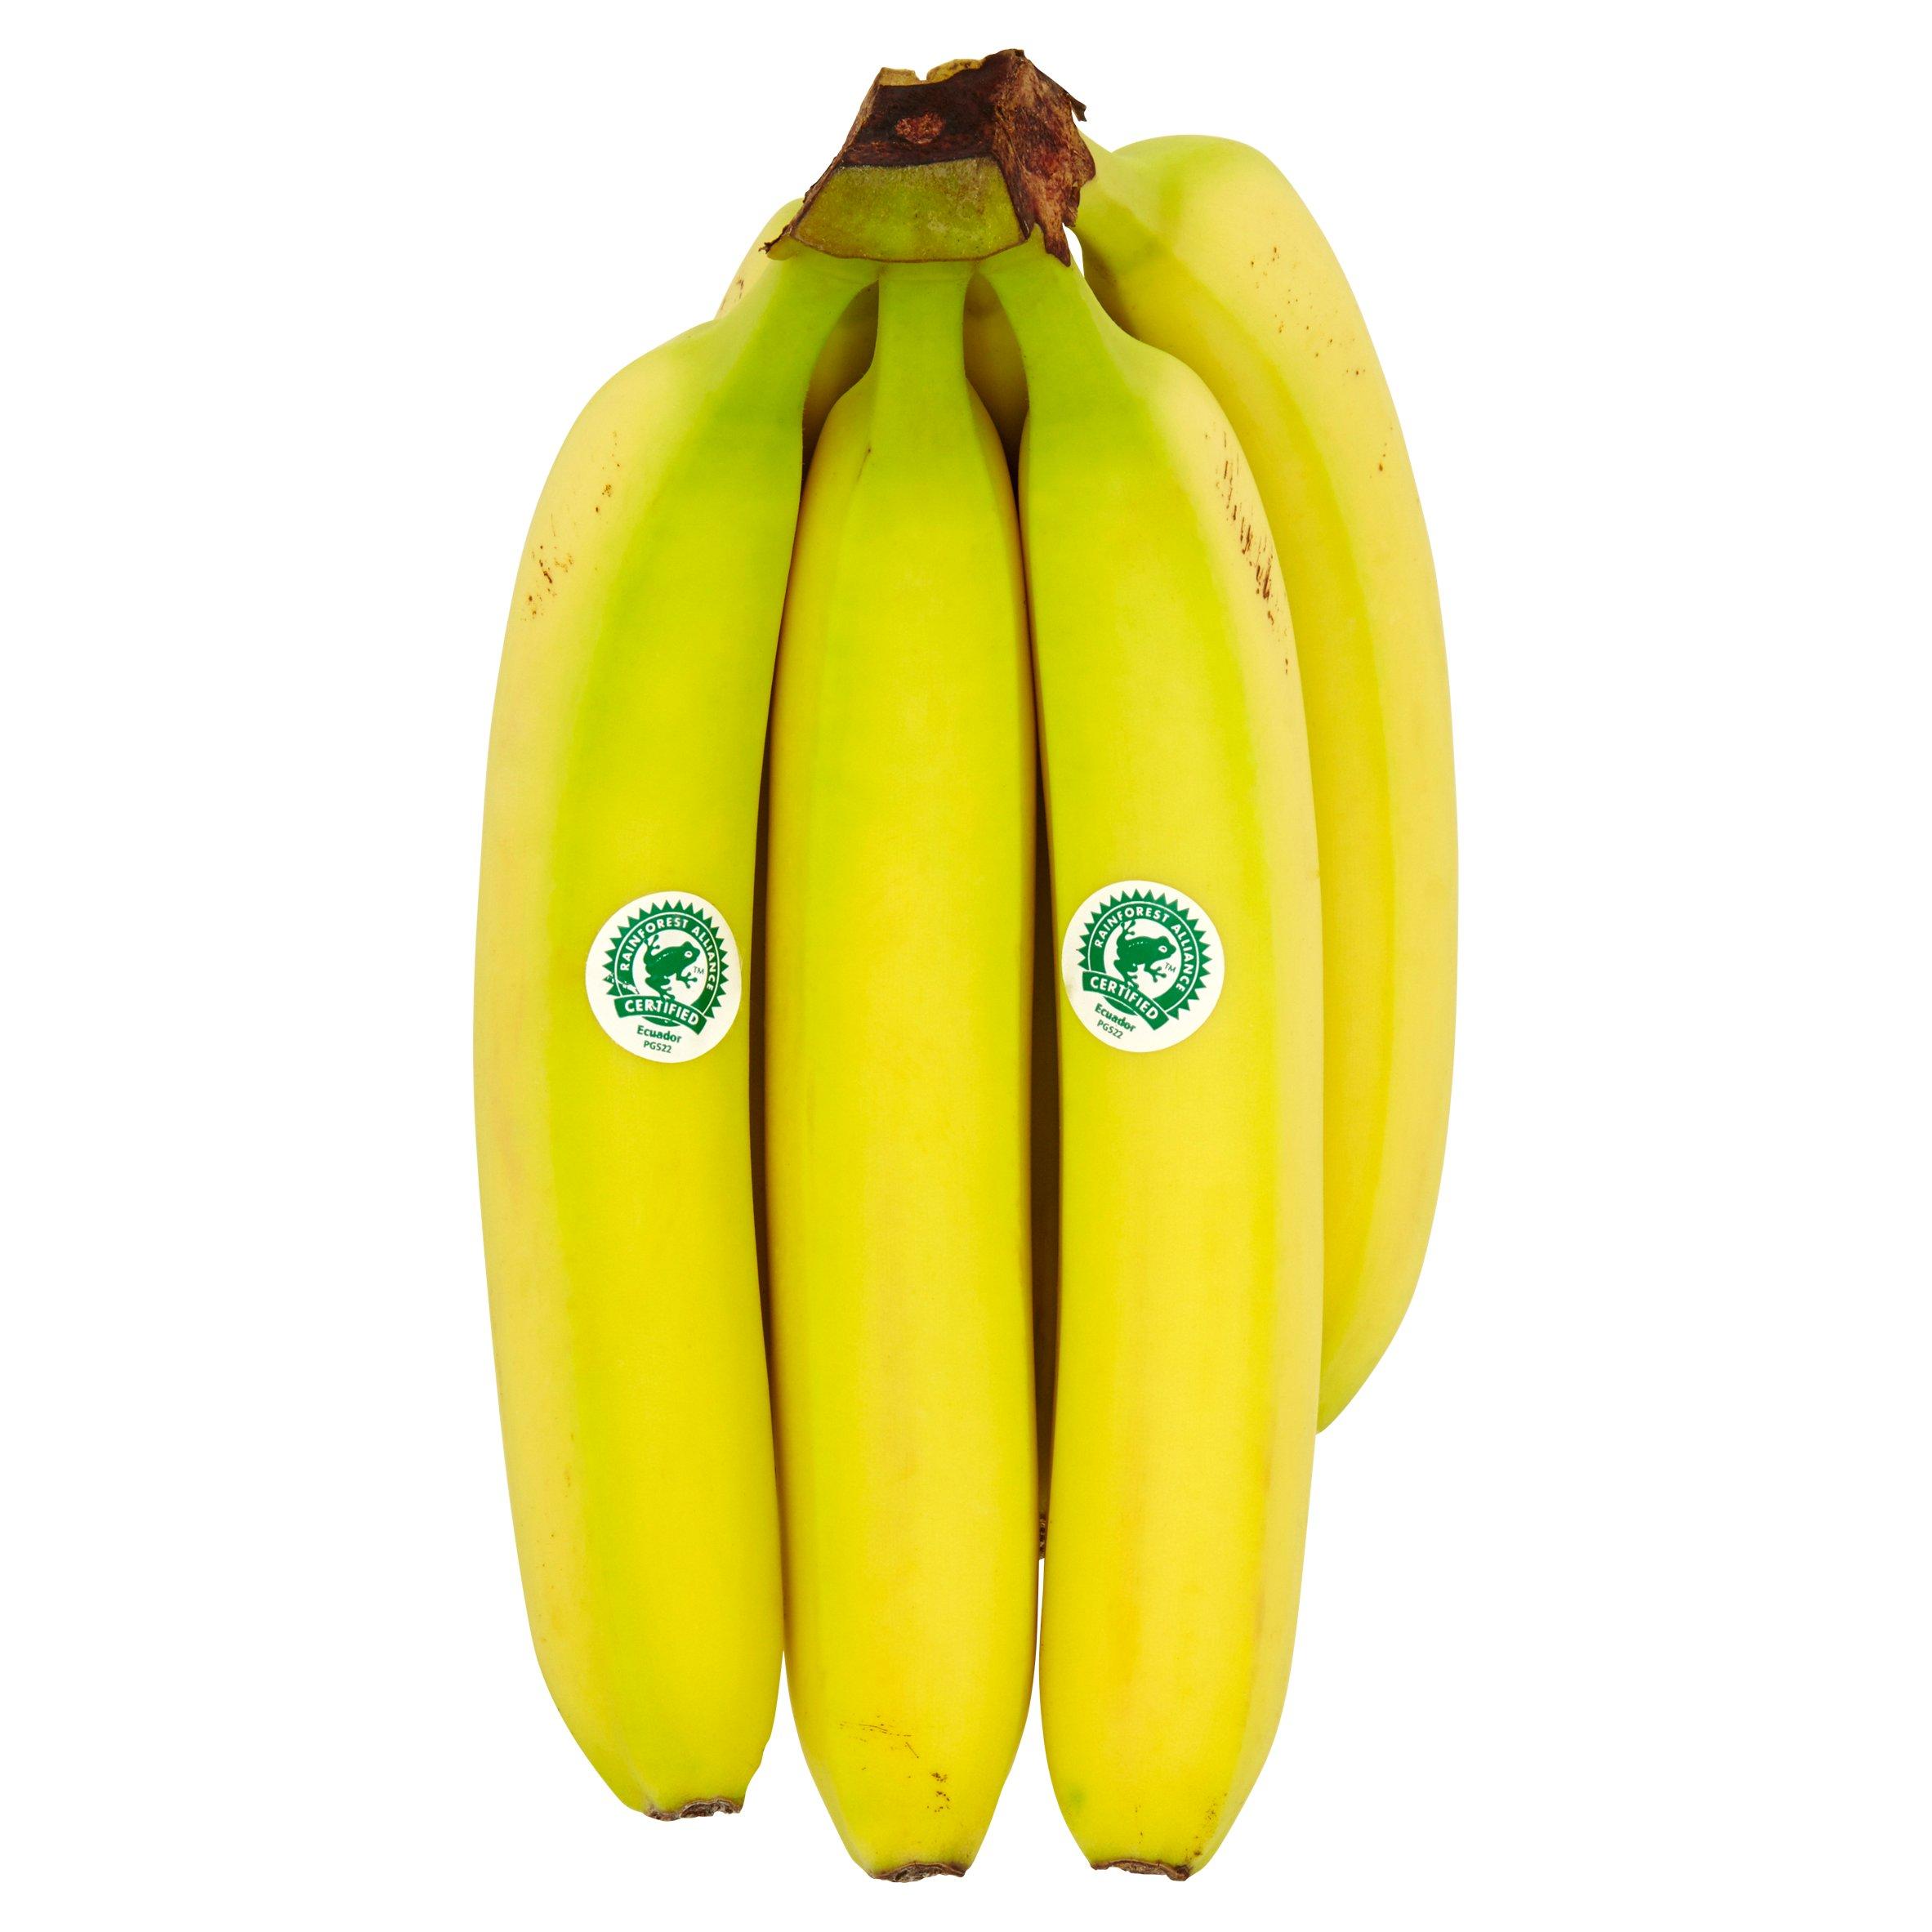 TESCO > Fresh Food > Bananas Loose